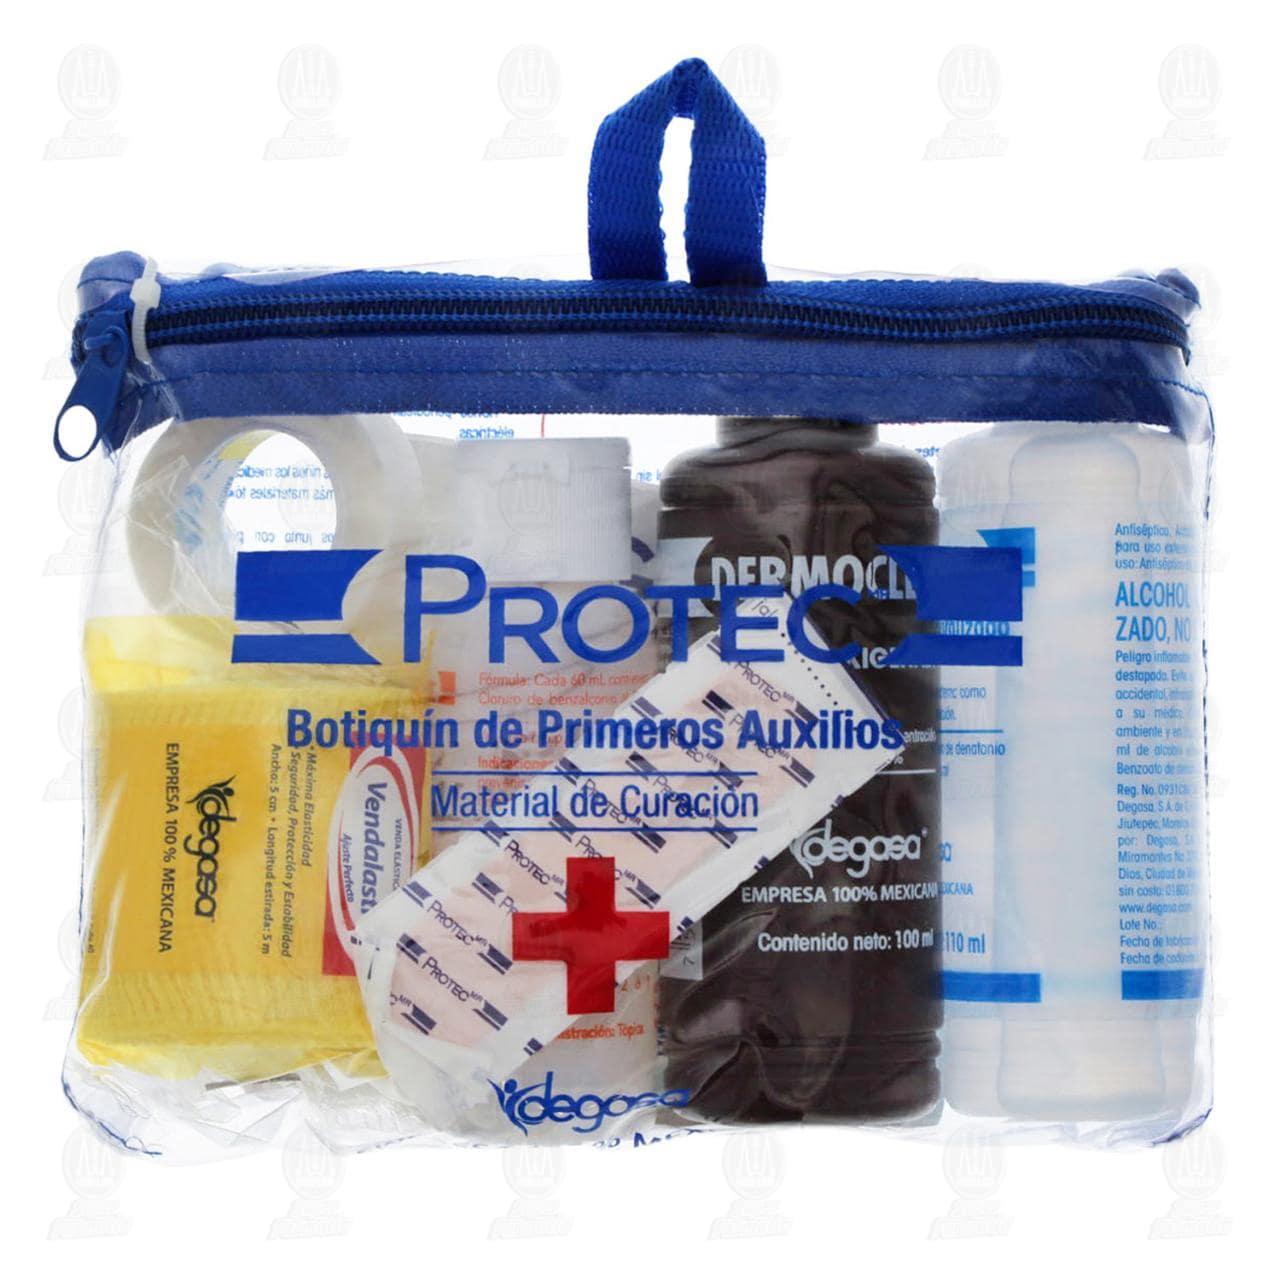 Comprar Botiquín Primeros Auxilios Protec 8pzas en Farmacias Guadalajara